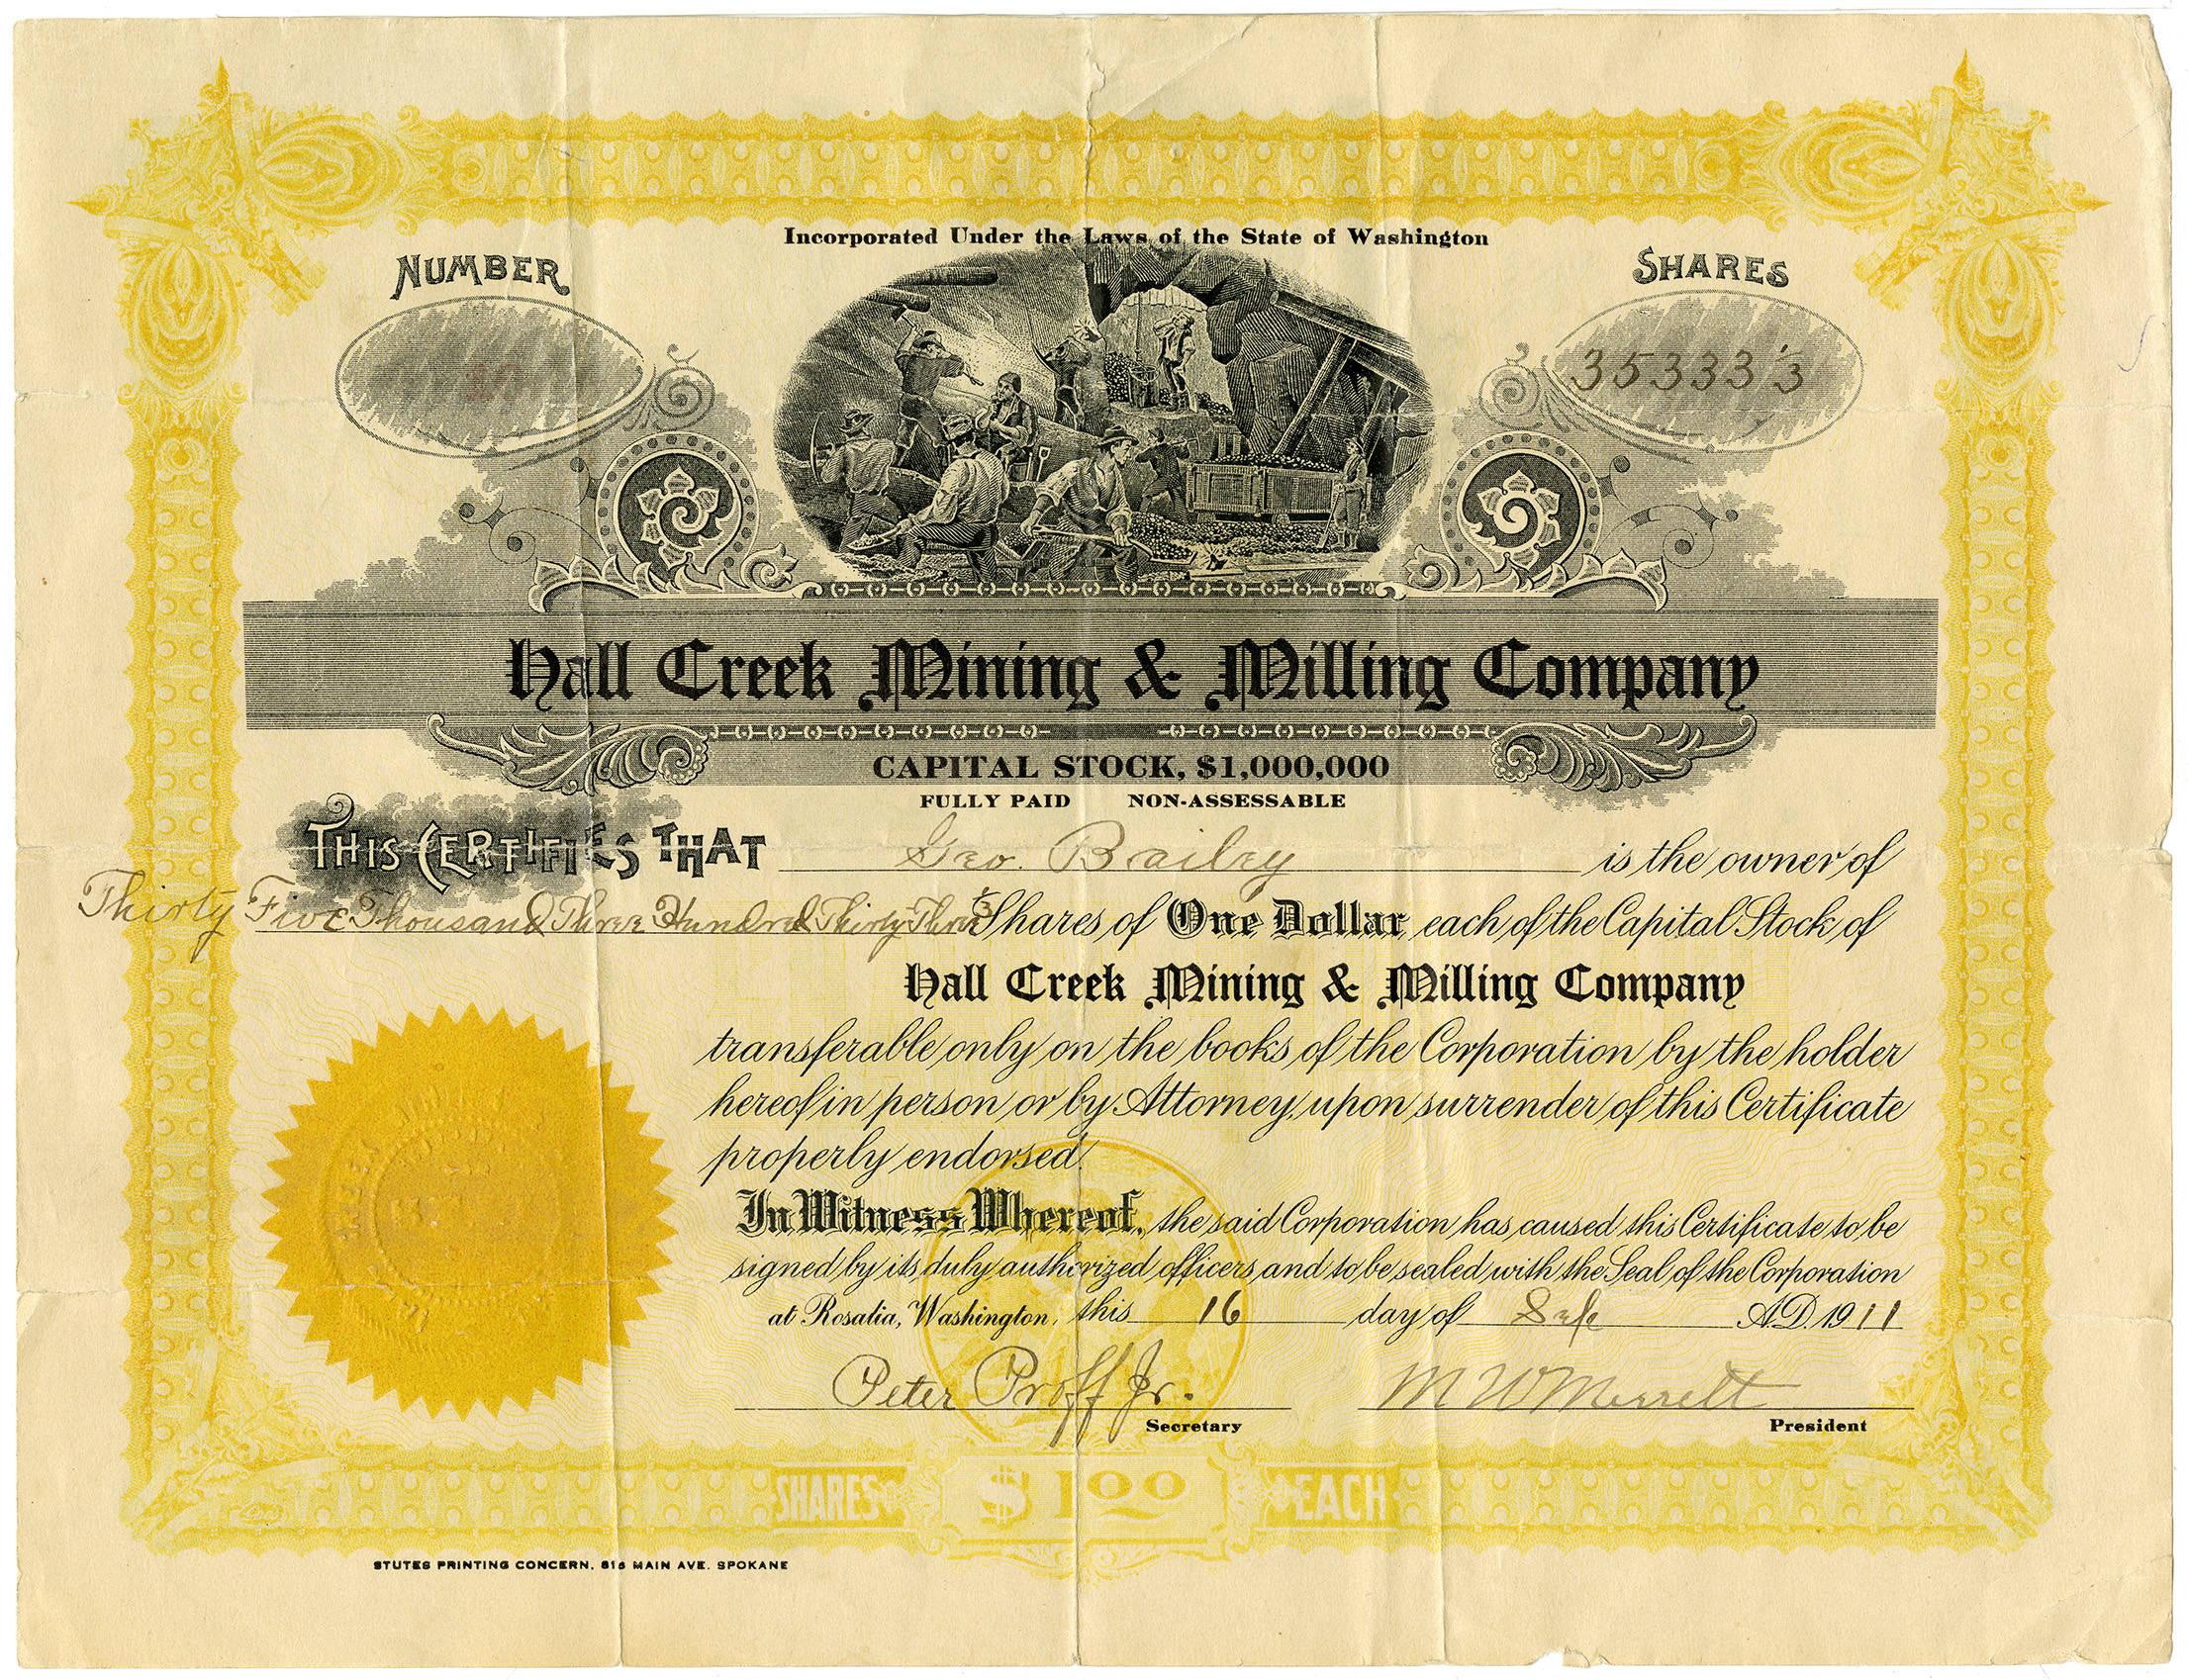 Hall_Creek_mining_stock_certificate_1911